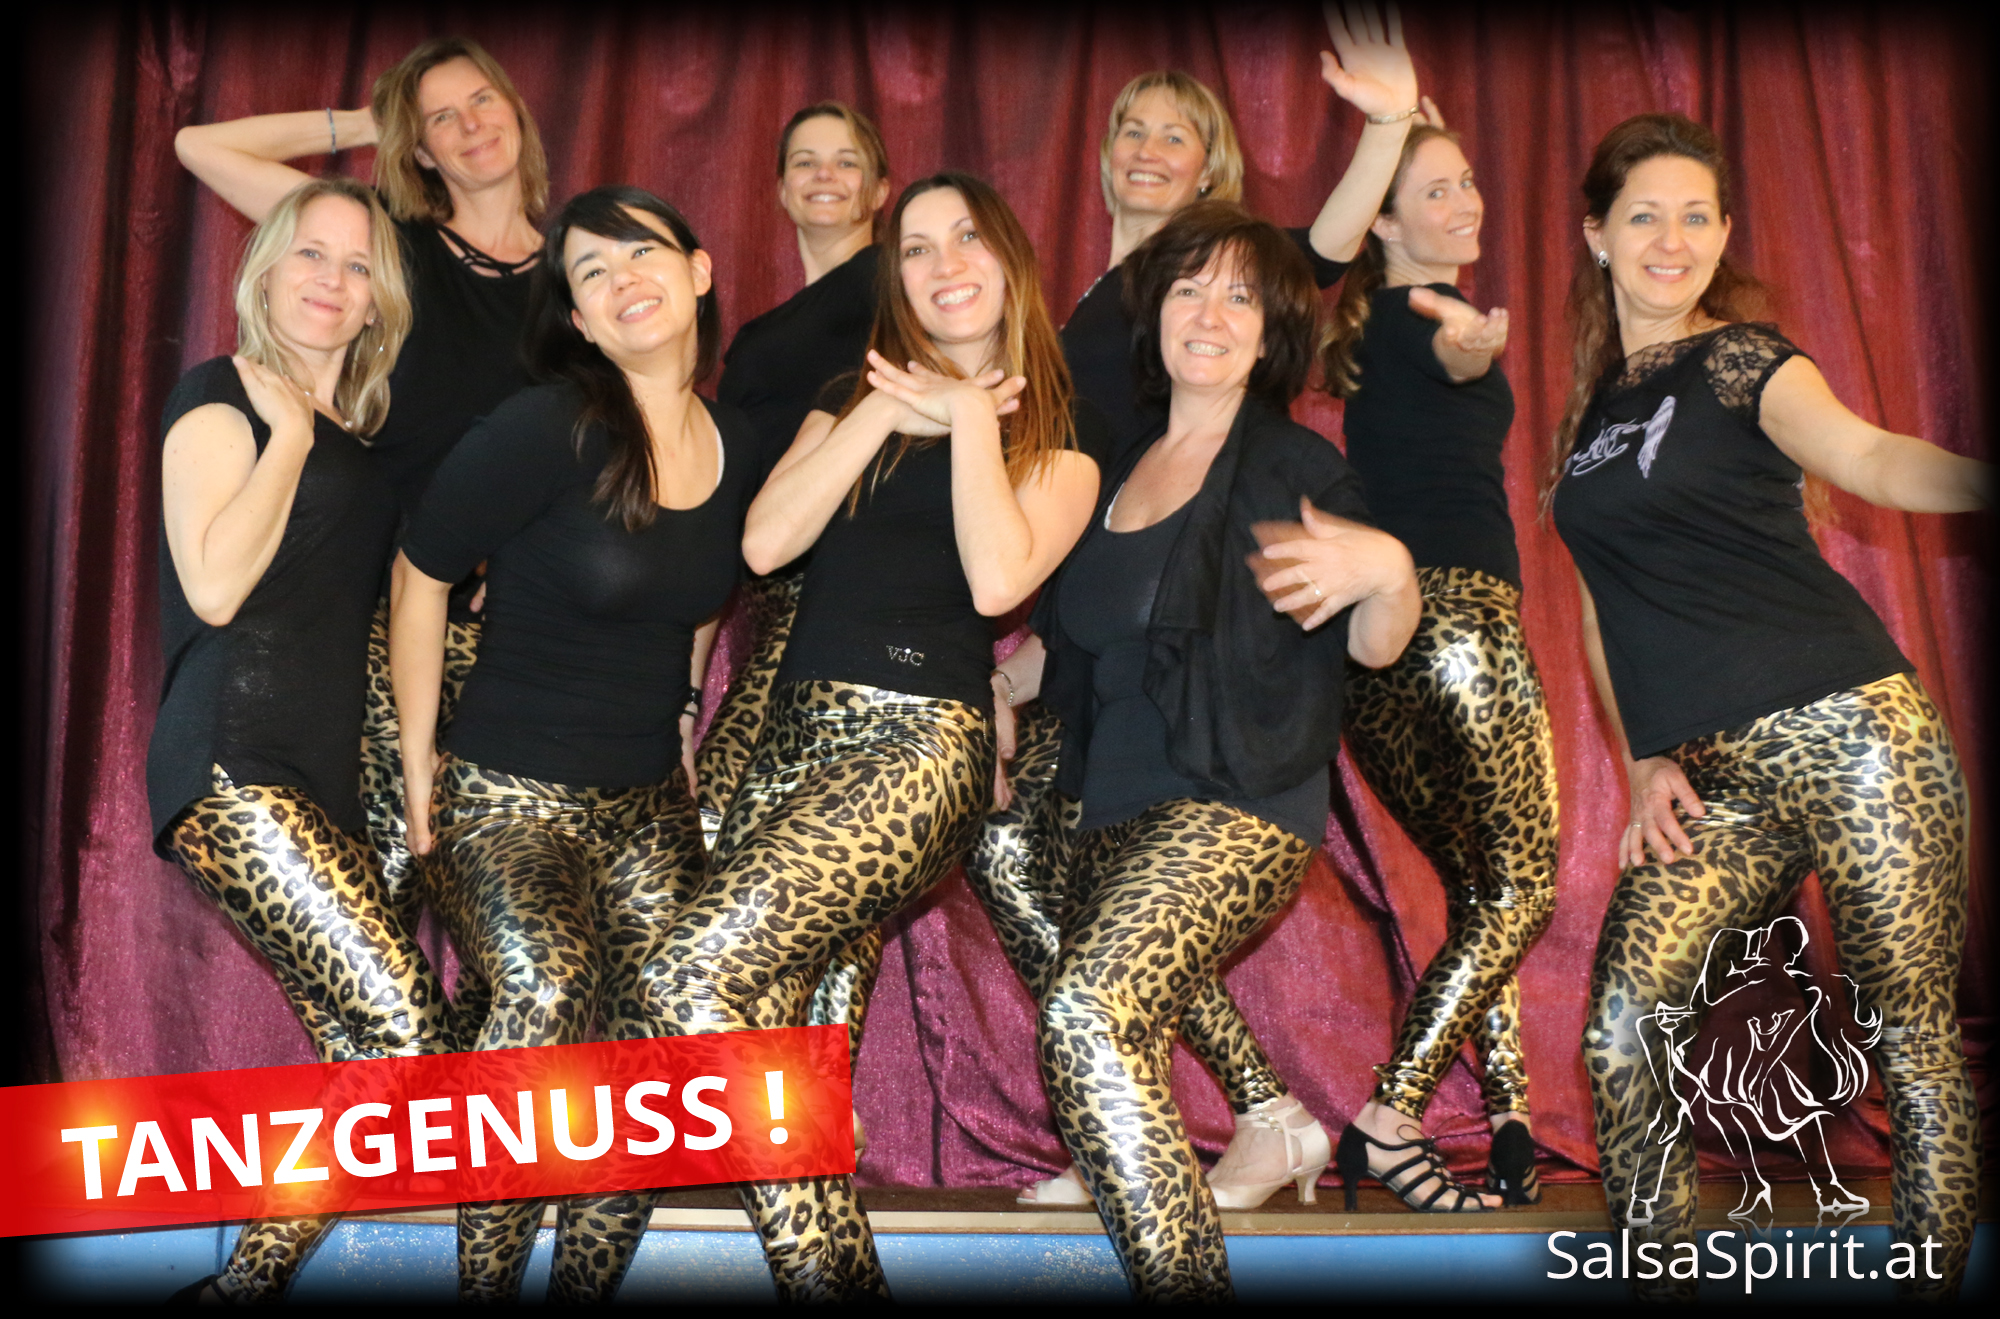 TanzgenussLadies3